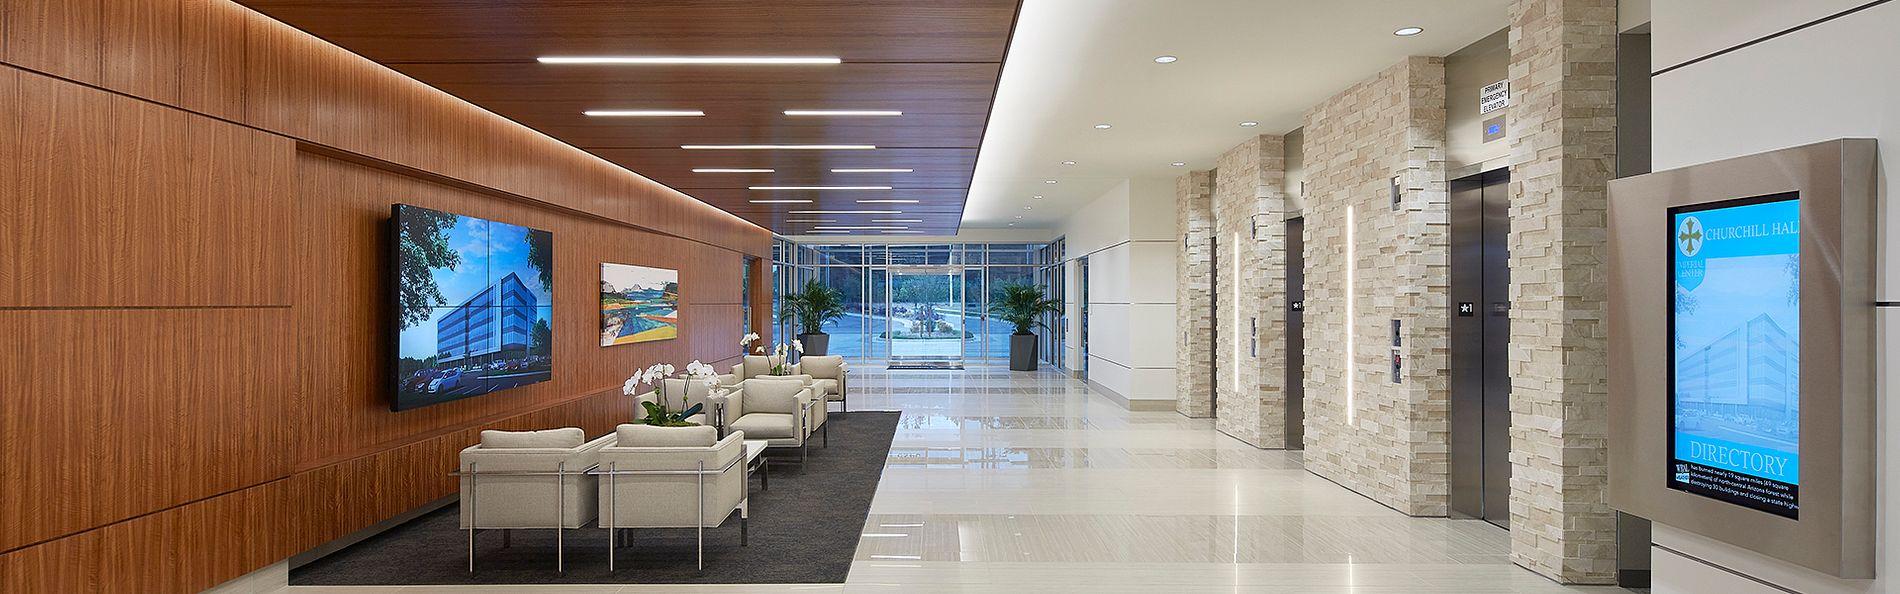 Main lobby area in the Churchill Hall Office Building